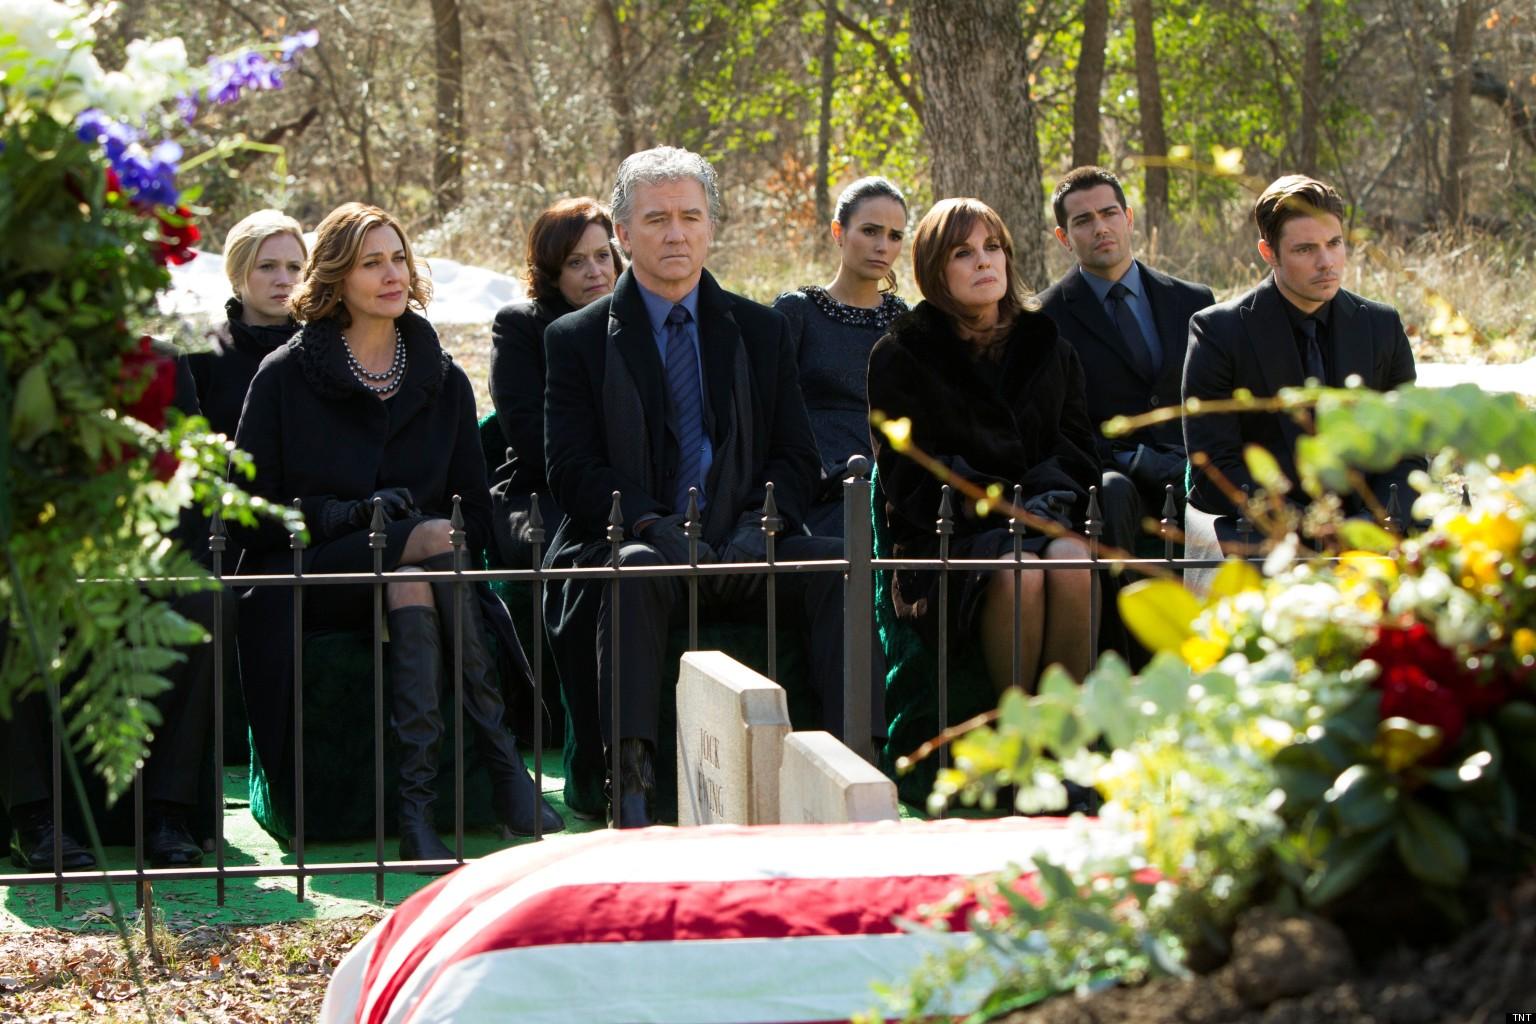 Http Www Huffingtonpost Com 2013 03 11 Dallas Jr Funeral N 2853010 Html